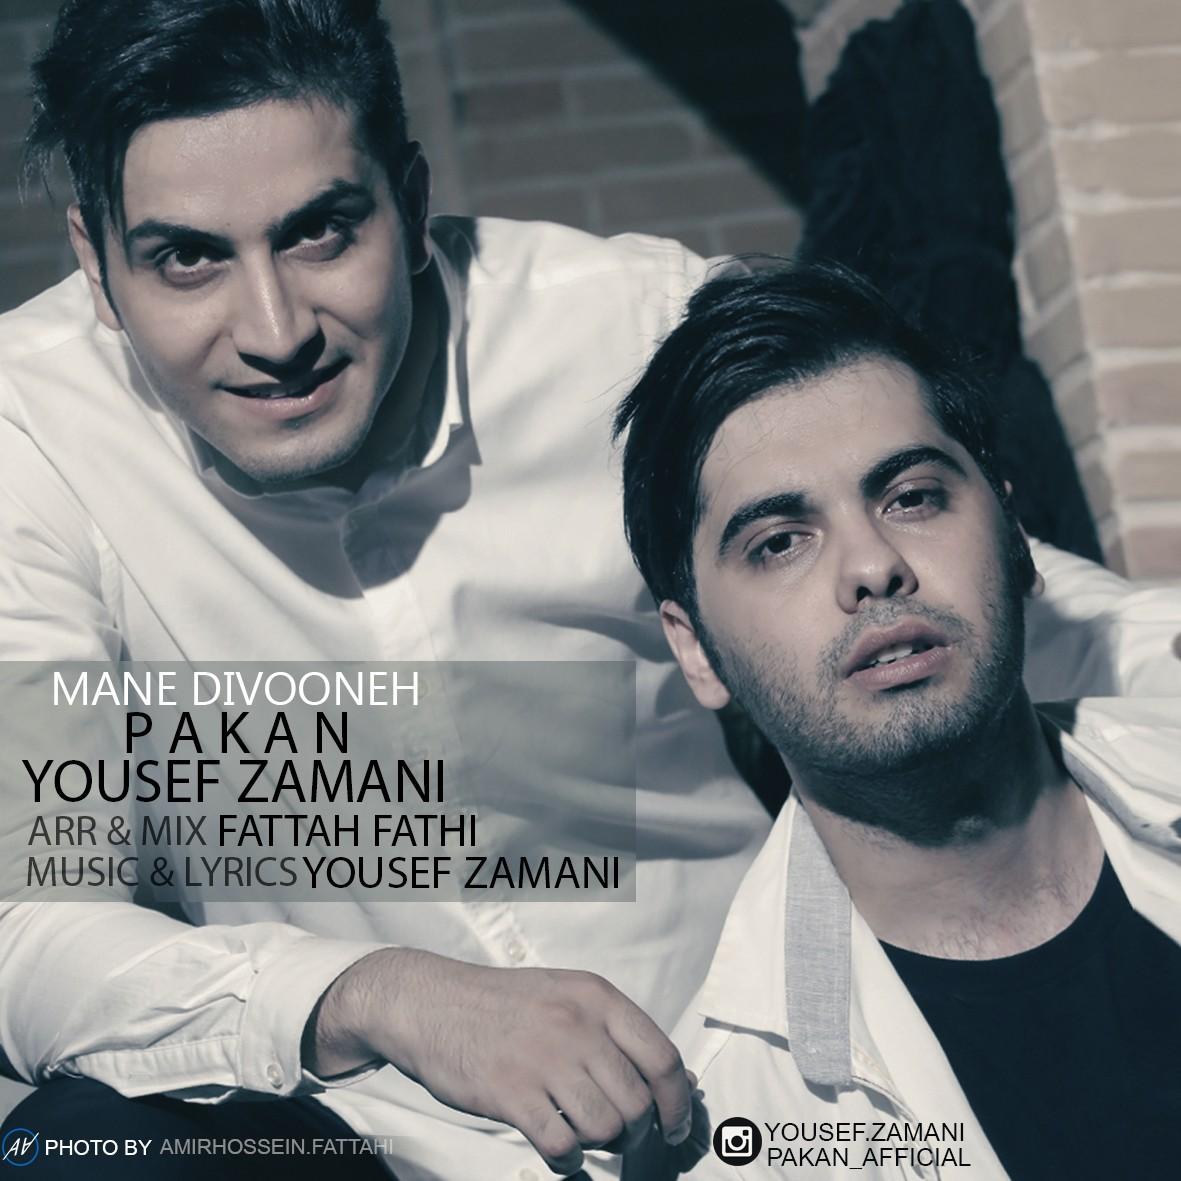 نامبر وان موزیک | دانلود آهنگ جدید Yousef-Zamani-Mane-Divooneh-Ft-Pakan